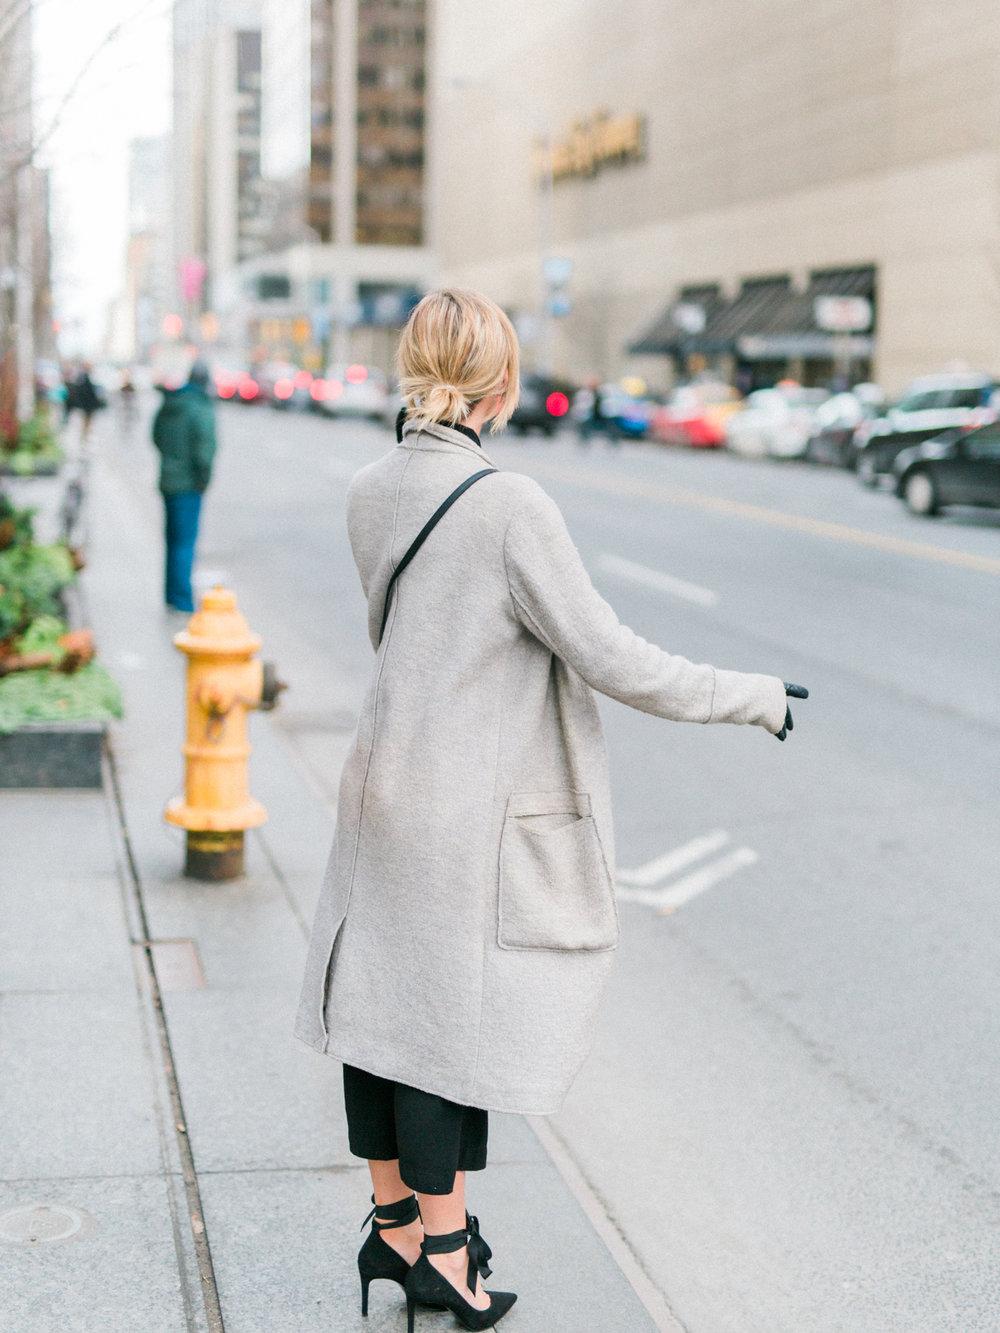 DanielleGirouxPhotography_Toronto_Portrait_StreetPhotography_0C6A1031.jpg